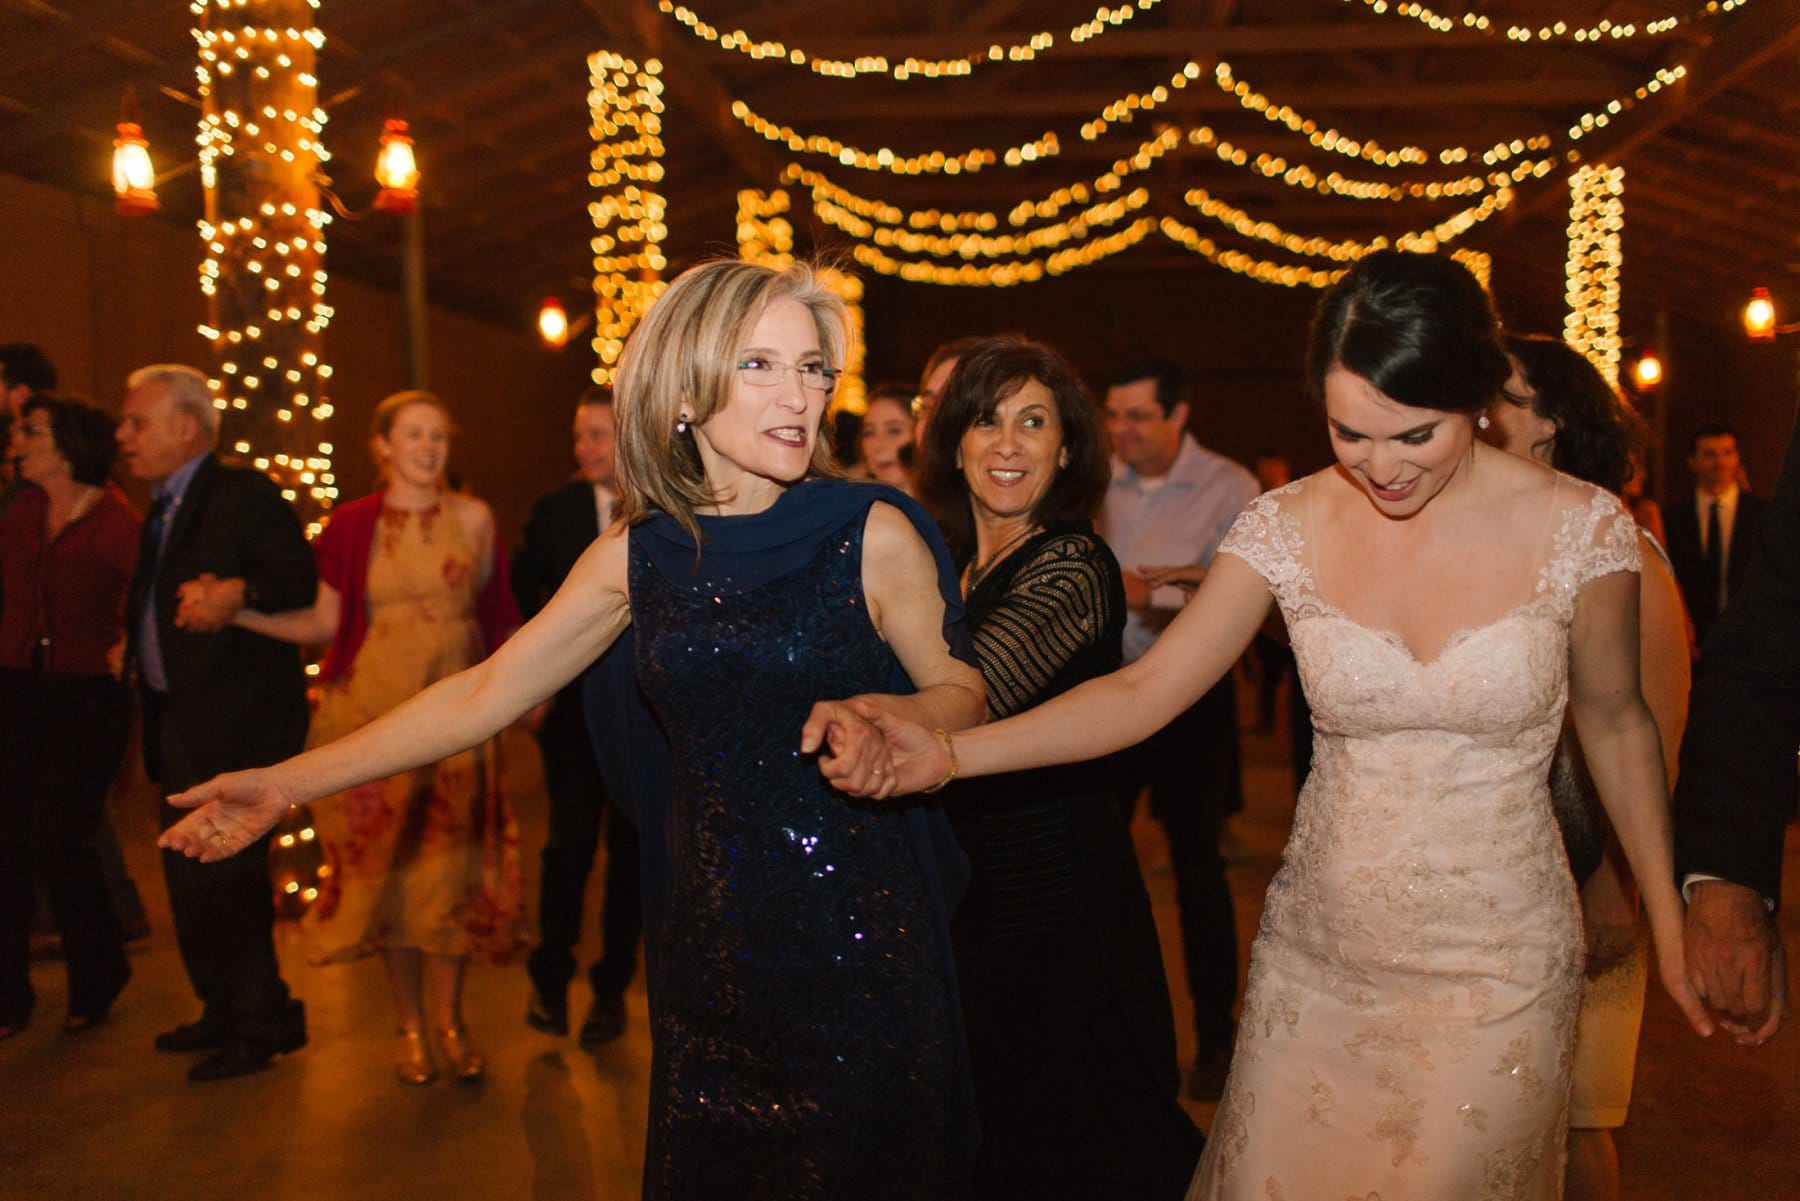 wedding horah at Desert Foothills barn wedding